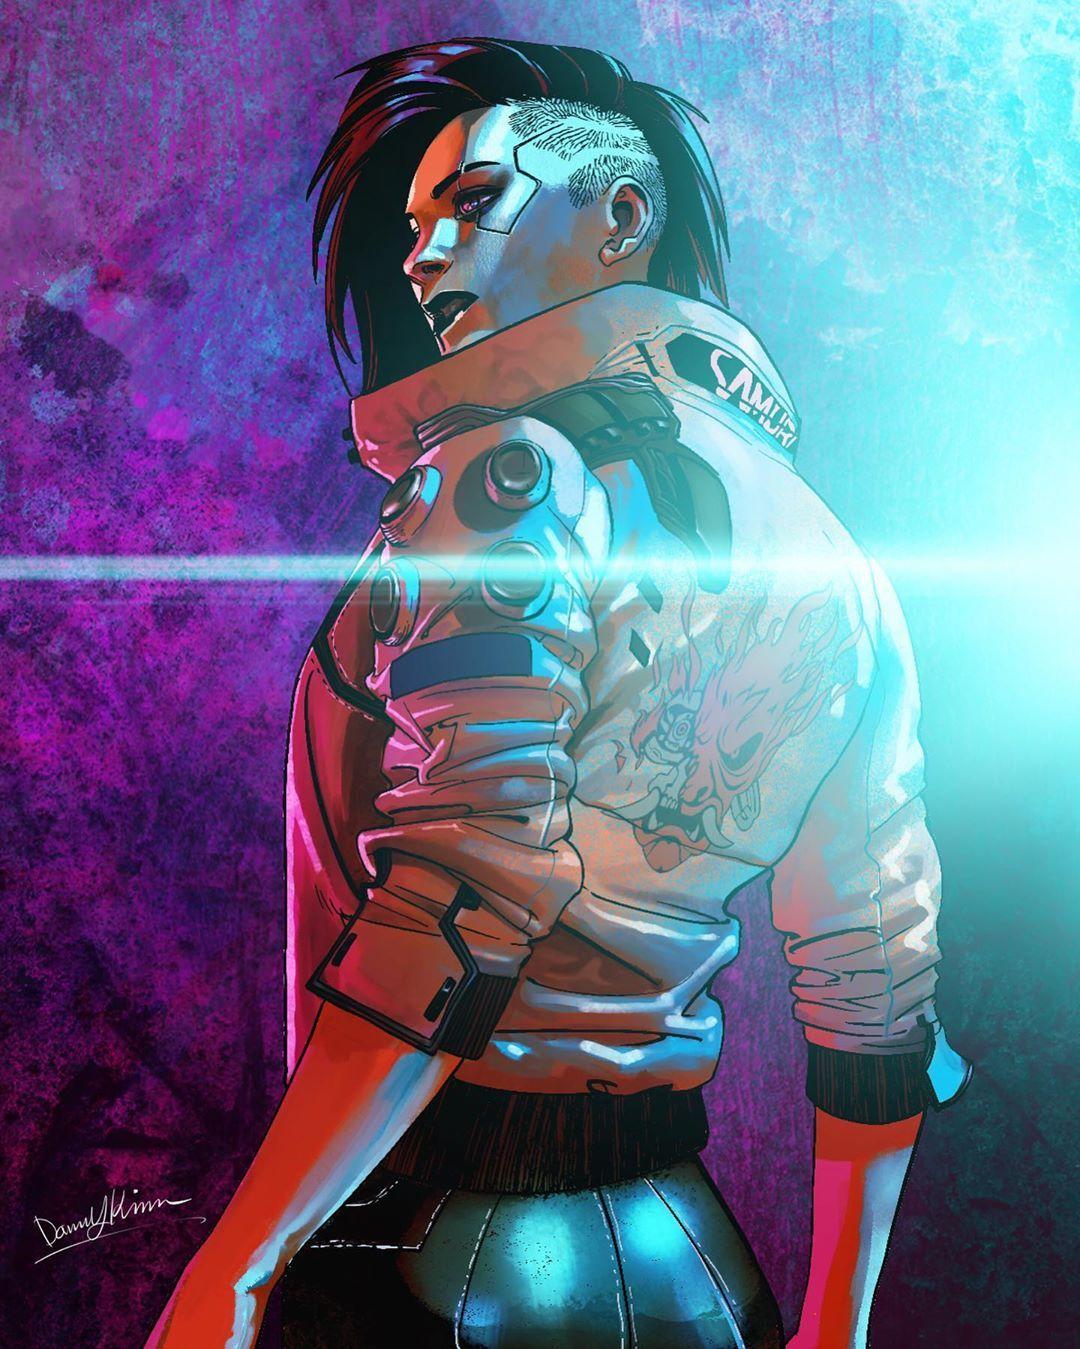 For Cyberpunk 2077 Lore check out Kazuliski. Cyberpunk